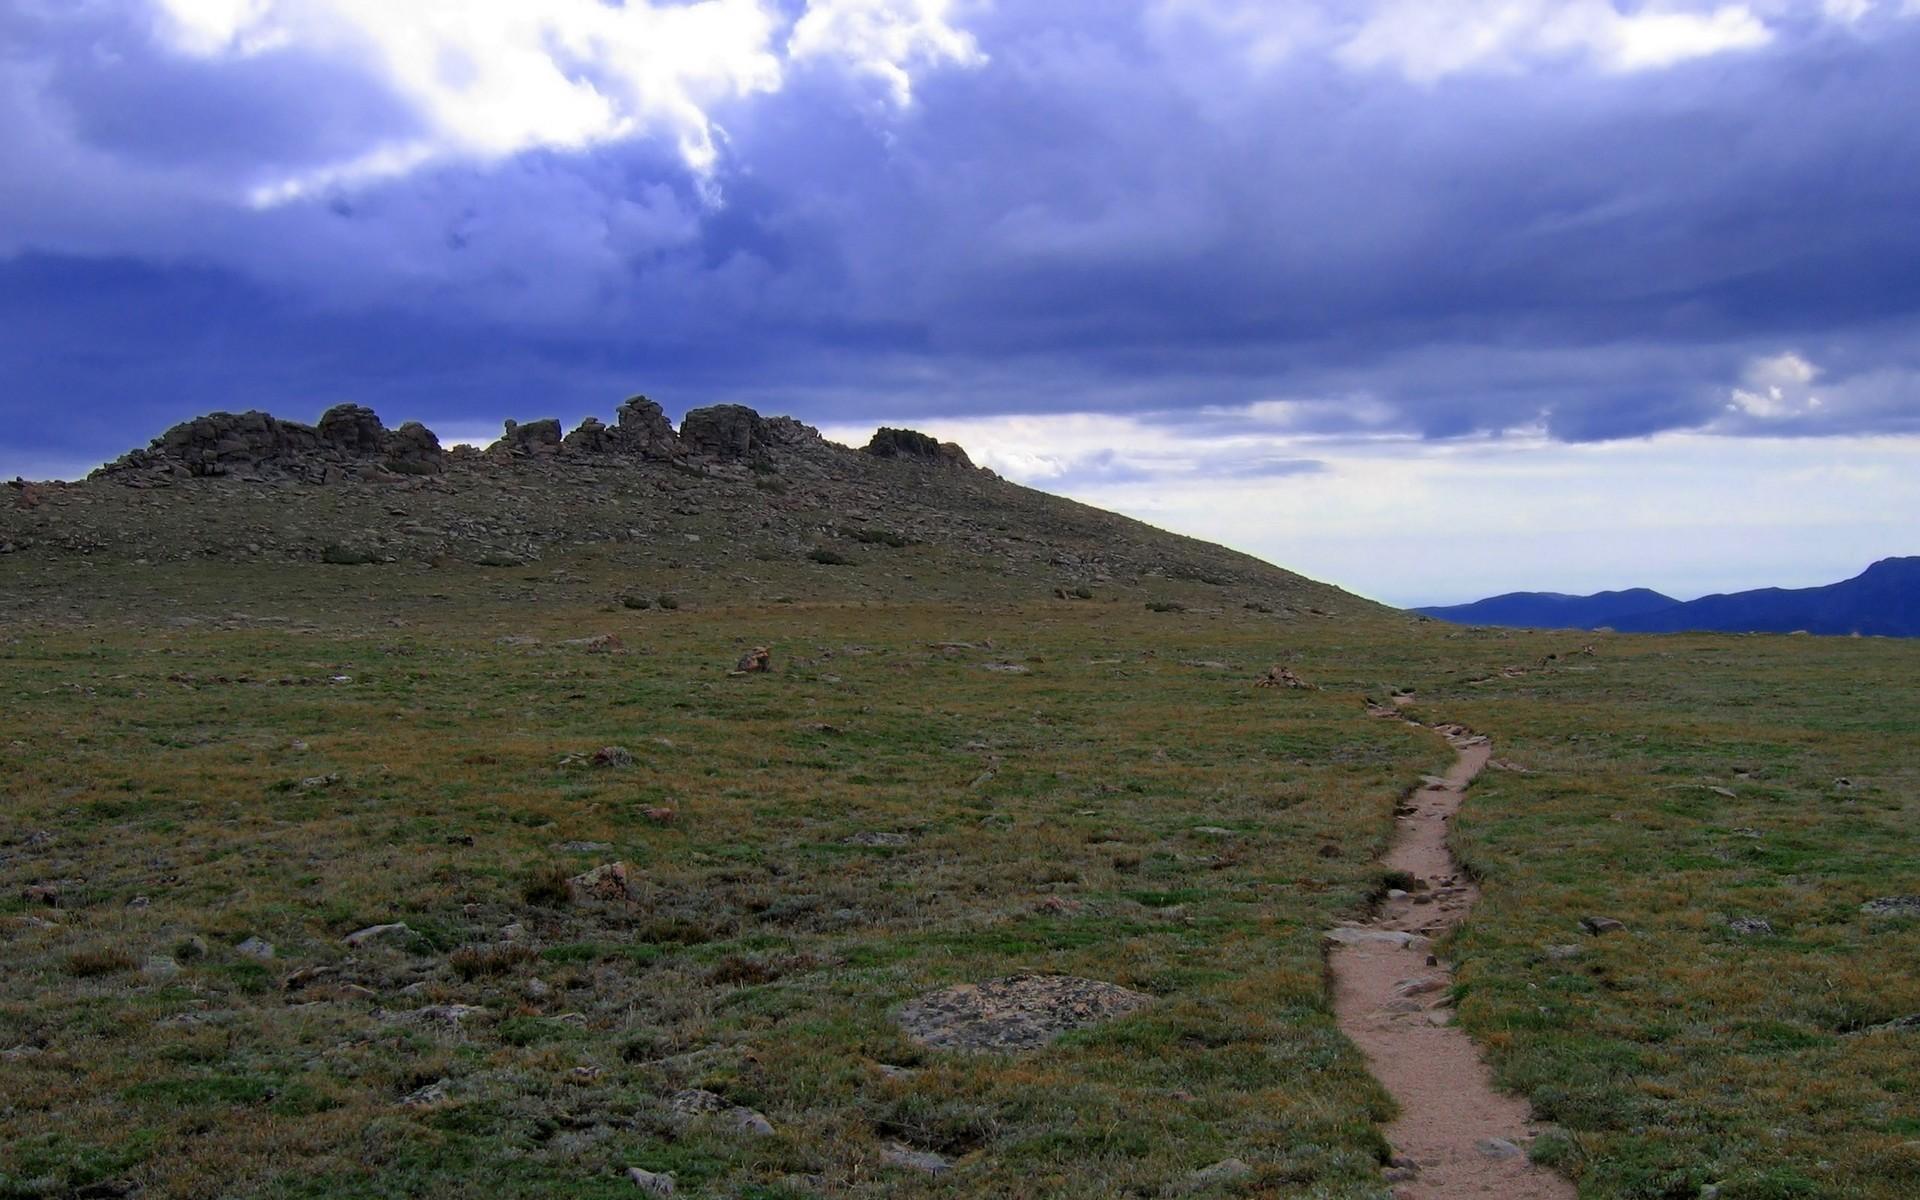 wallpaper mountain path - photo #34